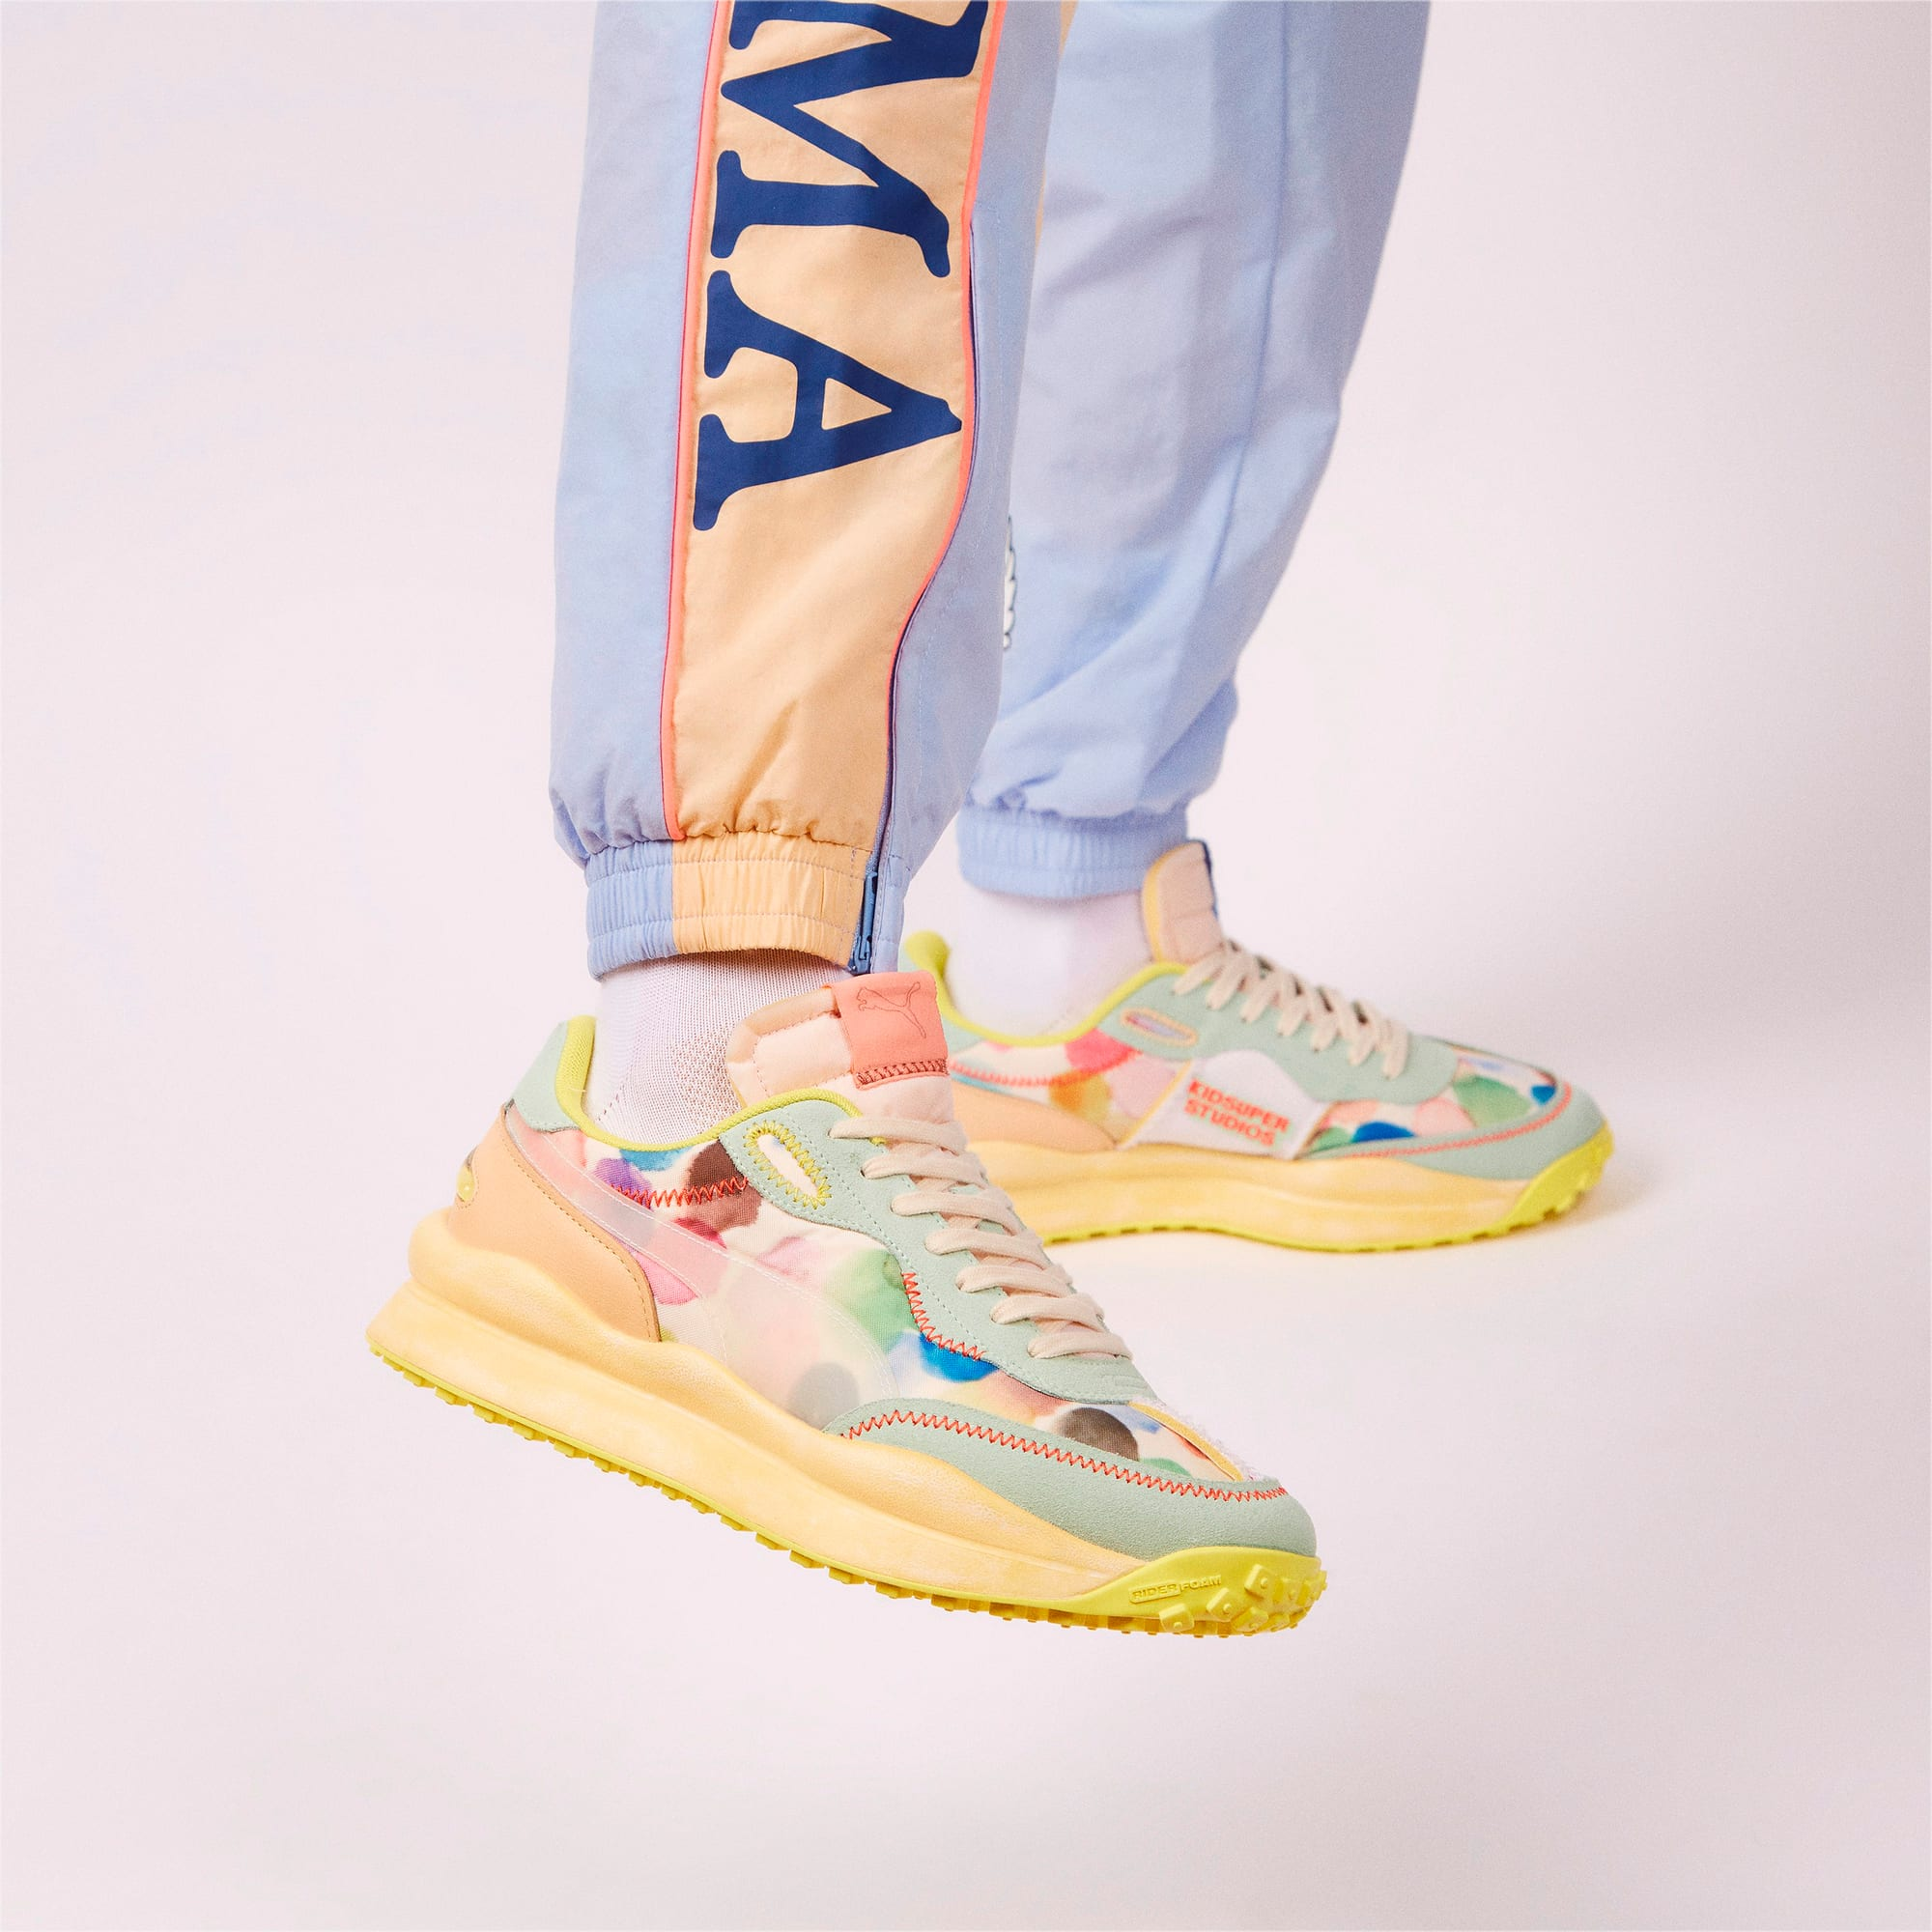 PUMA x KIDSUPER STUDIOS Style Rider Sneakers, Puma White-Dusty Aqua, extralarge